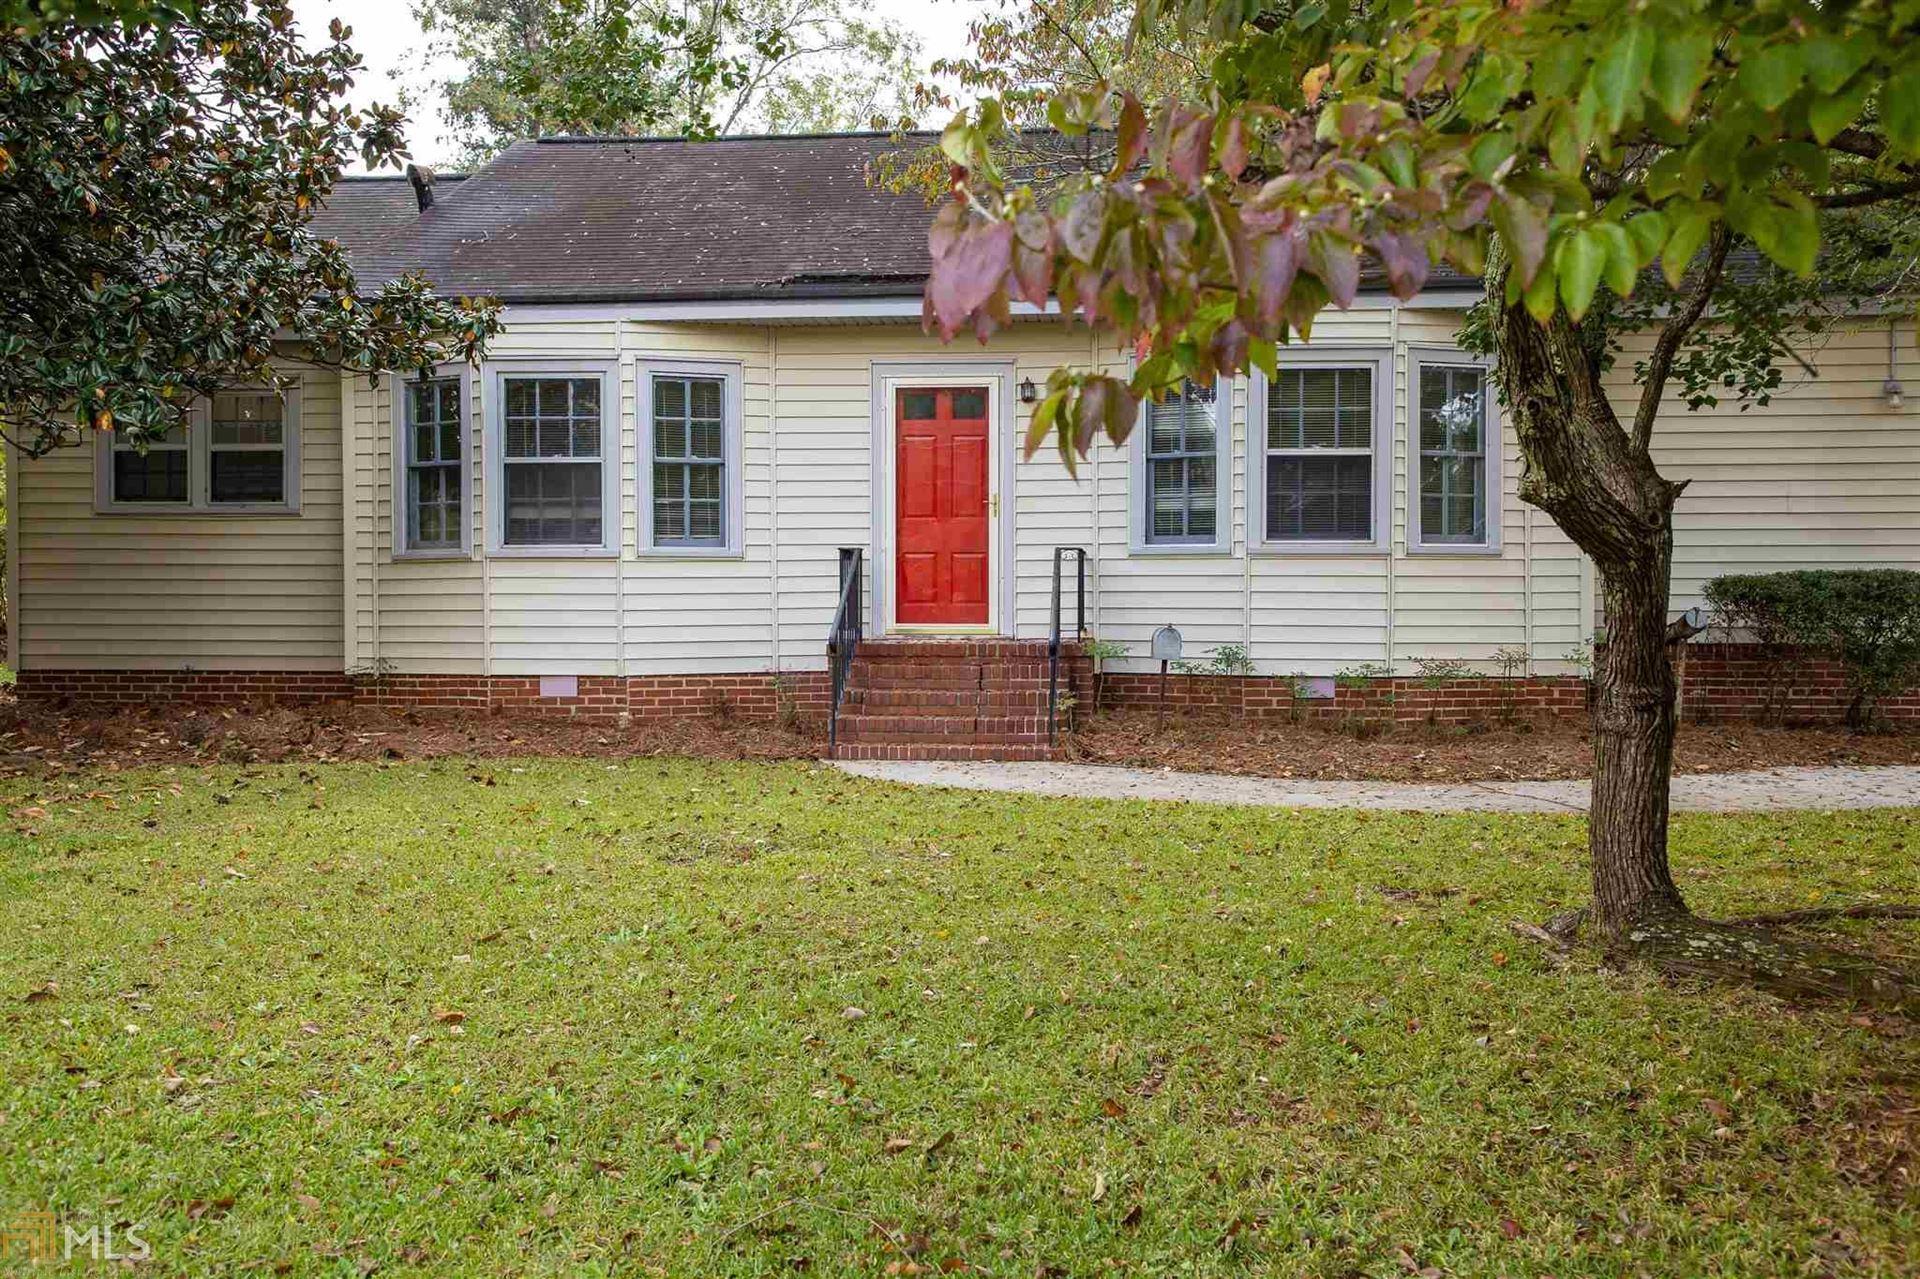 521 S Green St, Thomaston, GA 30286 - MLS#: 8875657